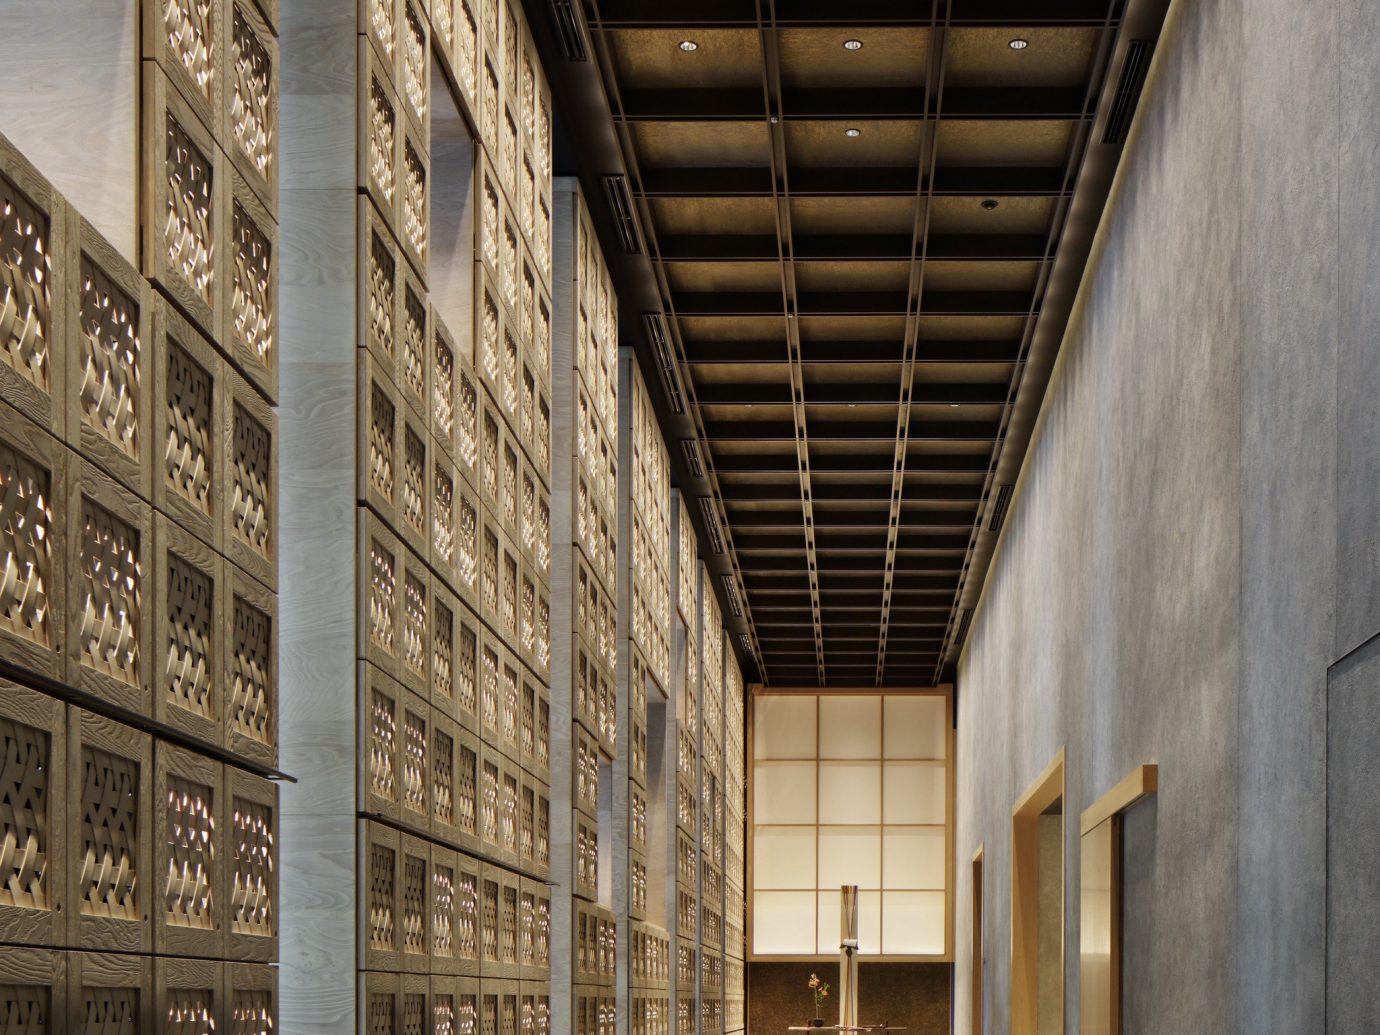 Trip Ideas building Architecture floor interior design hall daylighting facade estate wood tourist attraction Design symmetry flooring professional ceiling